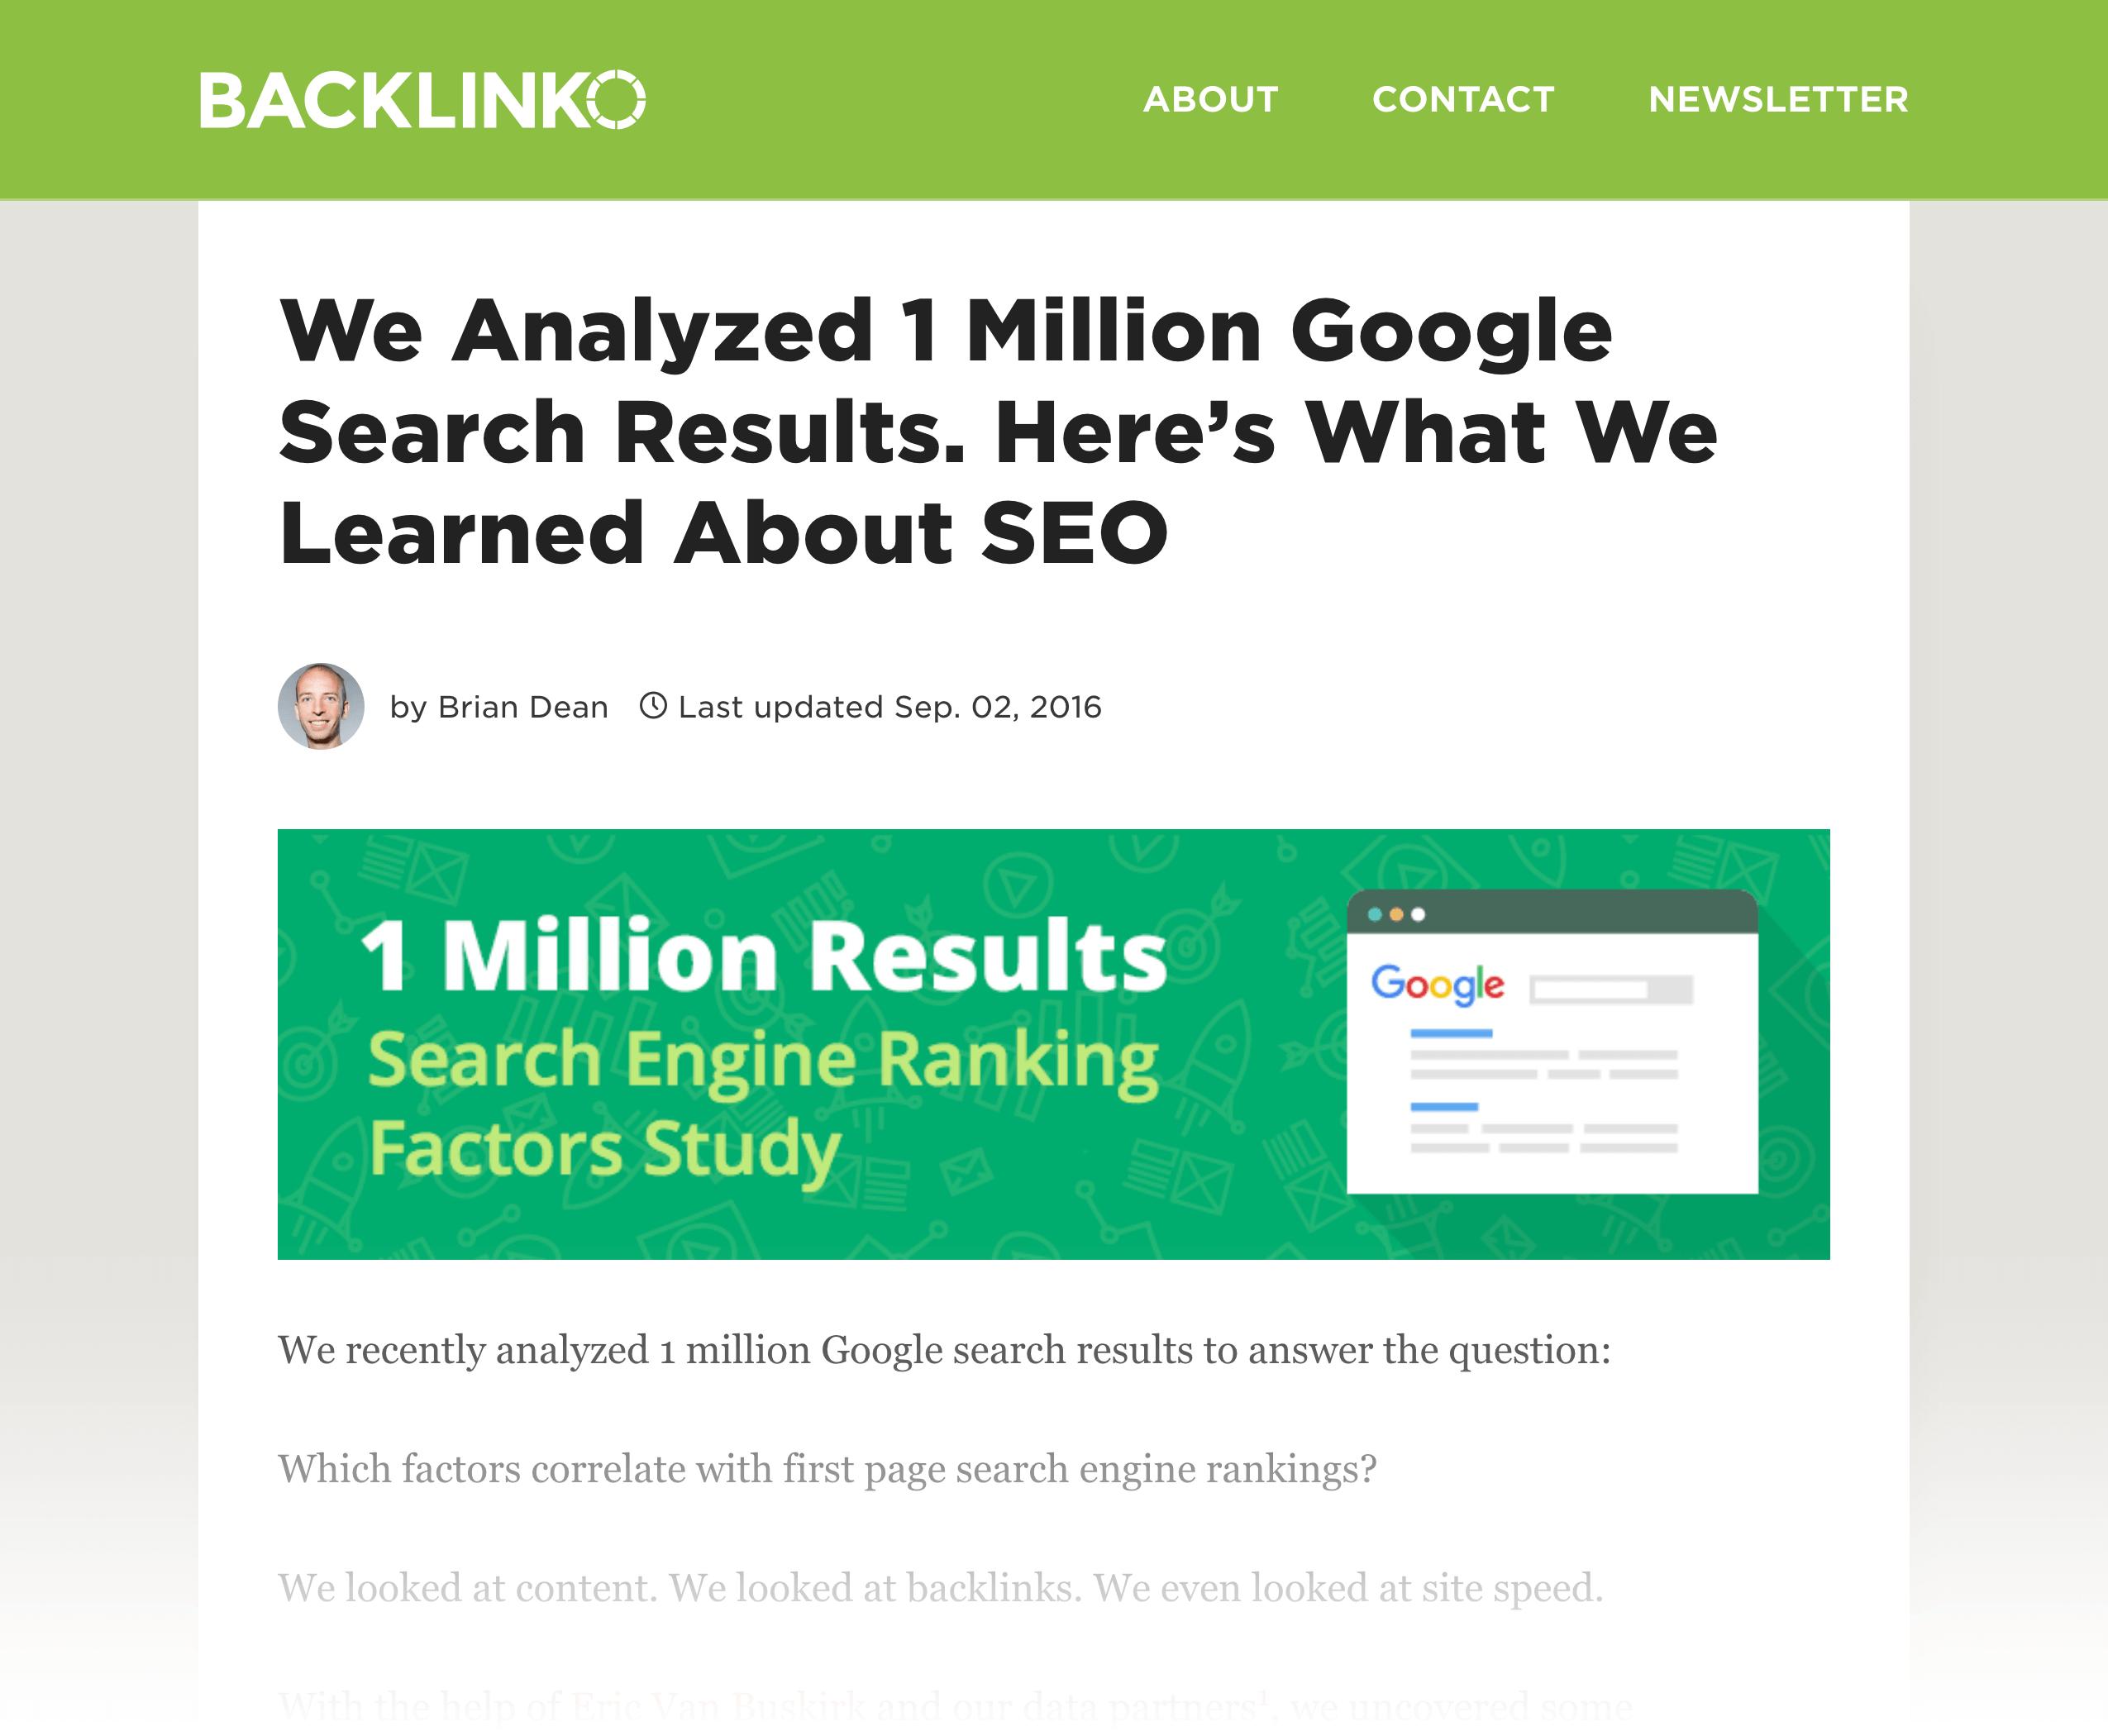 Google Ranking Factors study